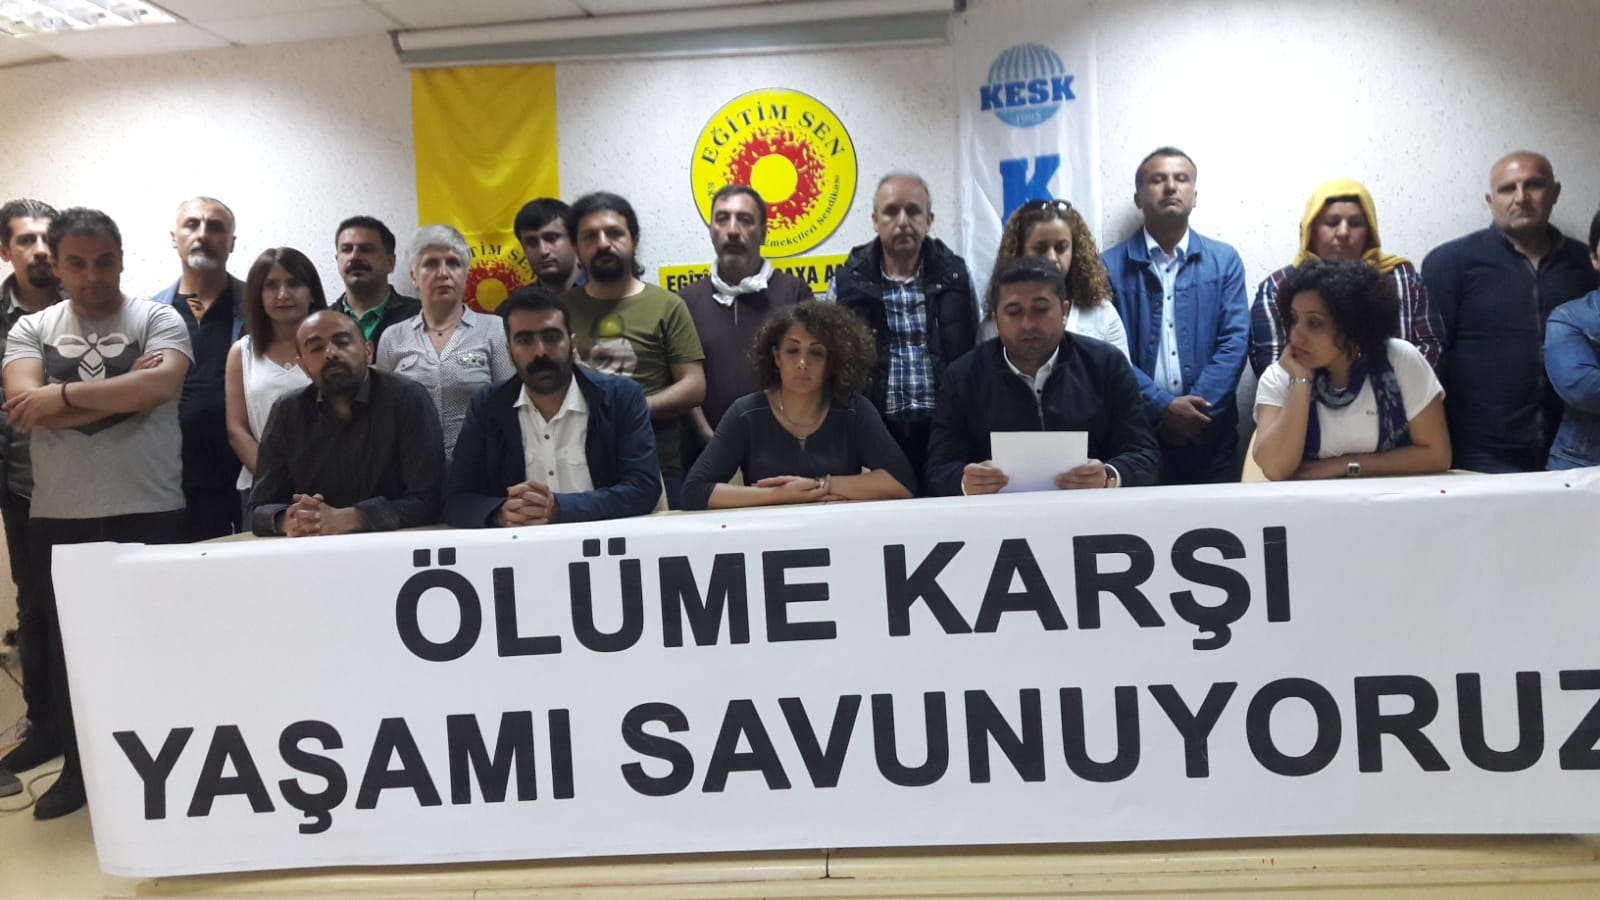 Diyarbakır: Çok Geç Olmadan Yaşama Ses Olun